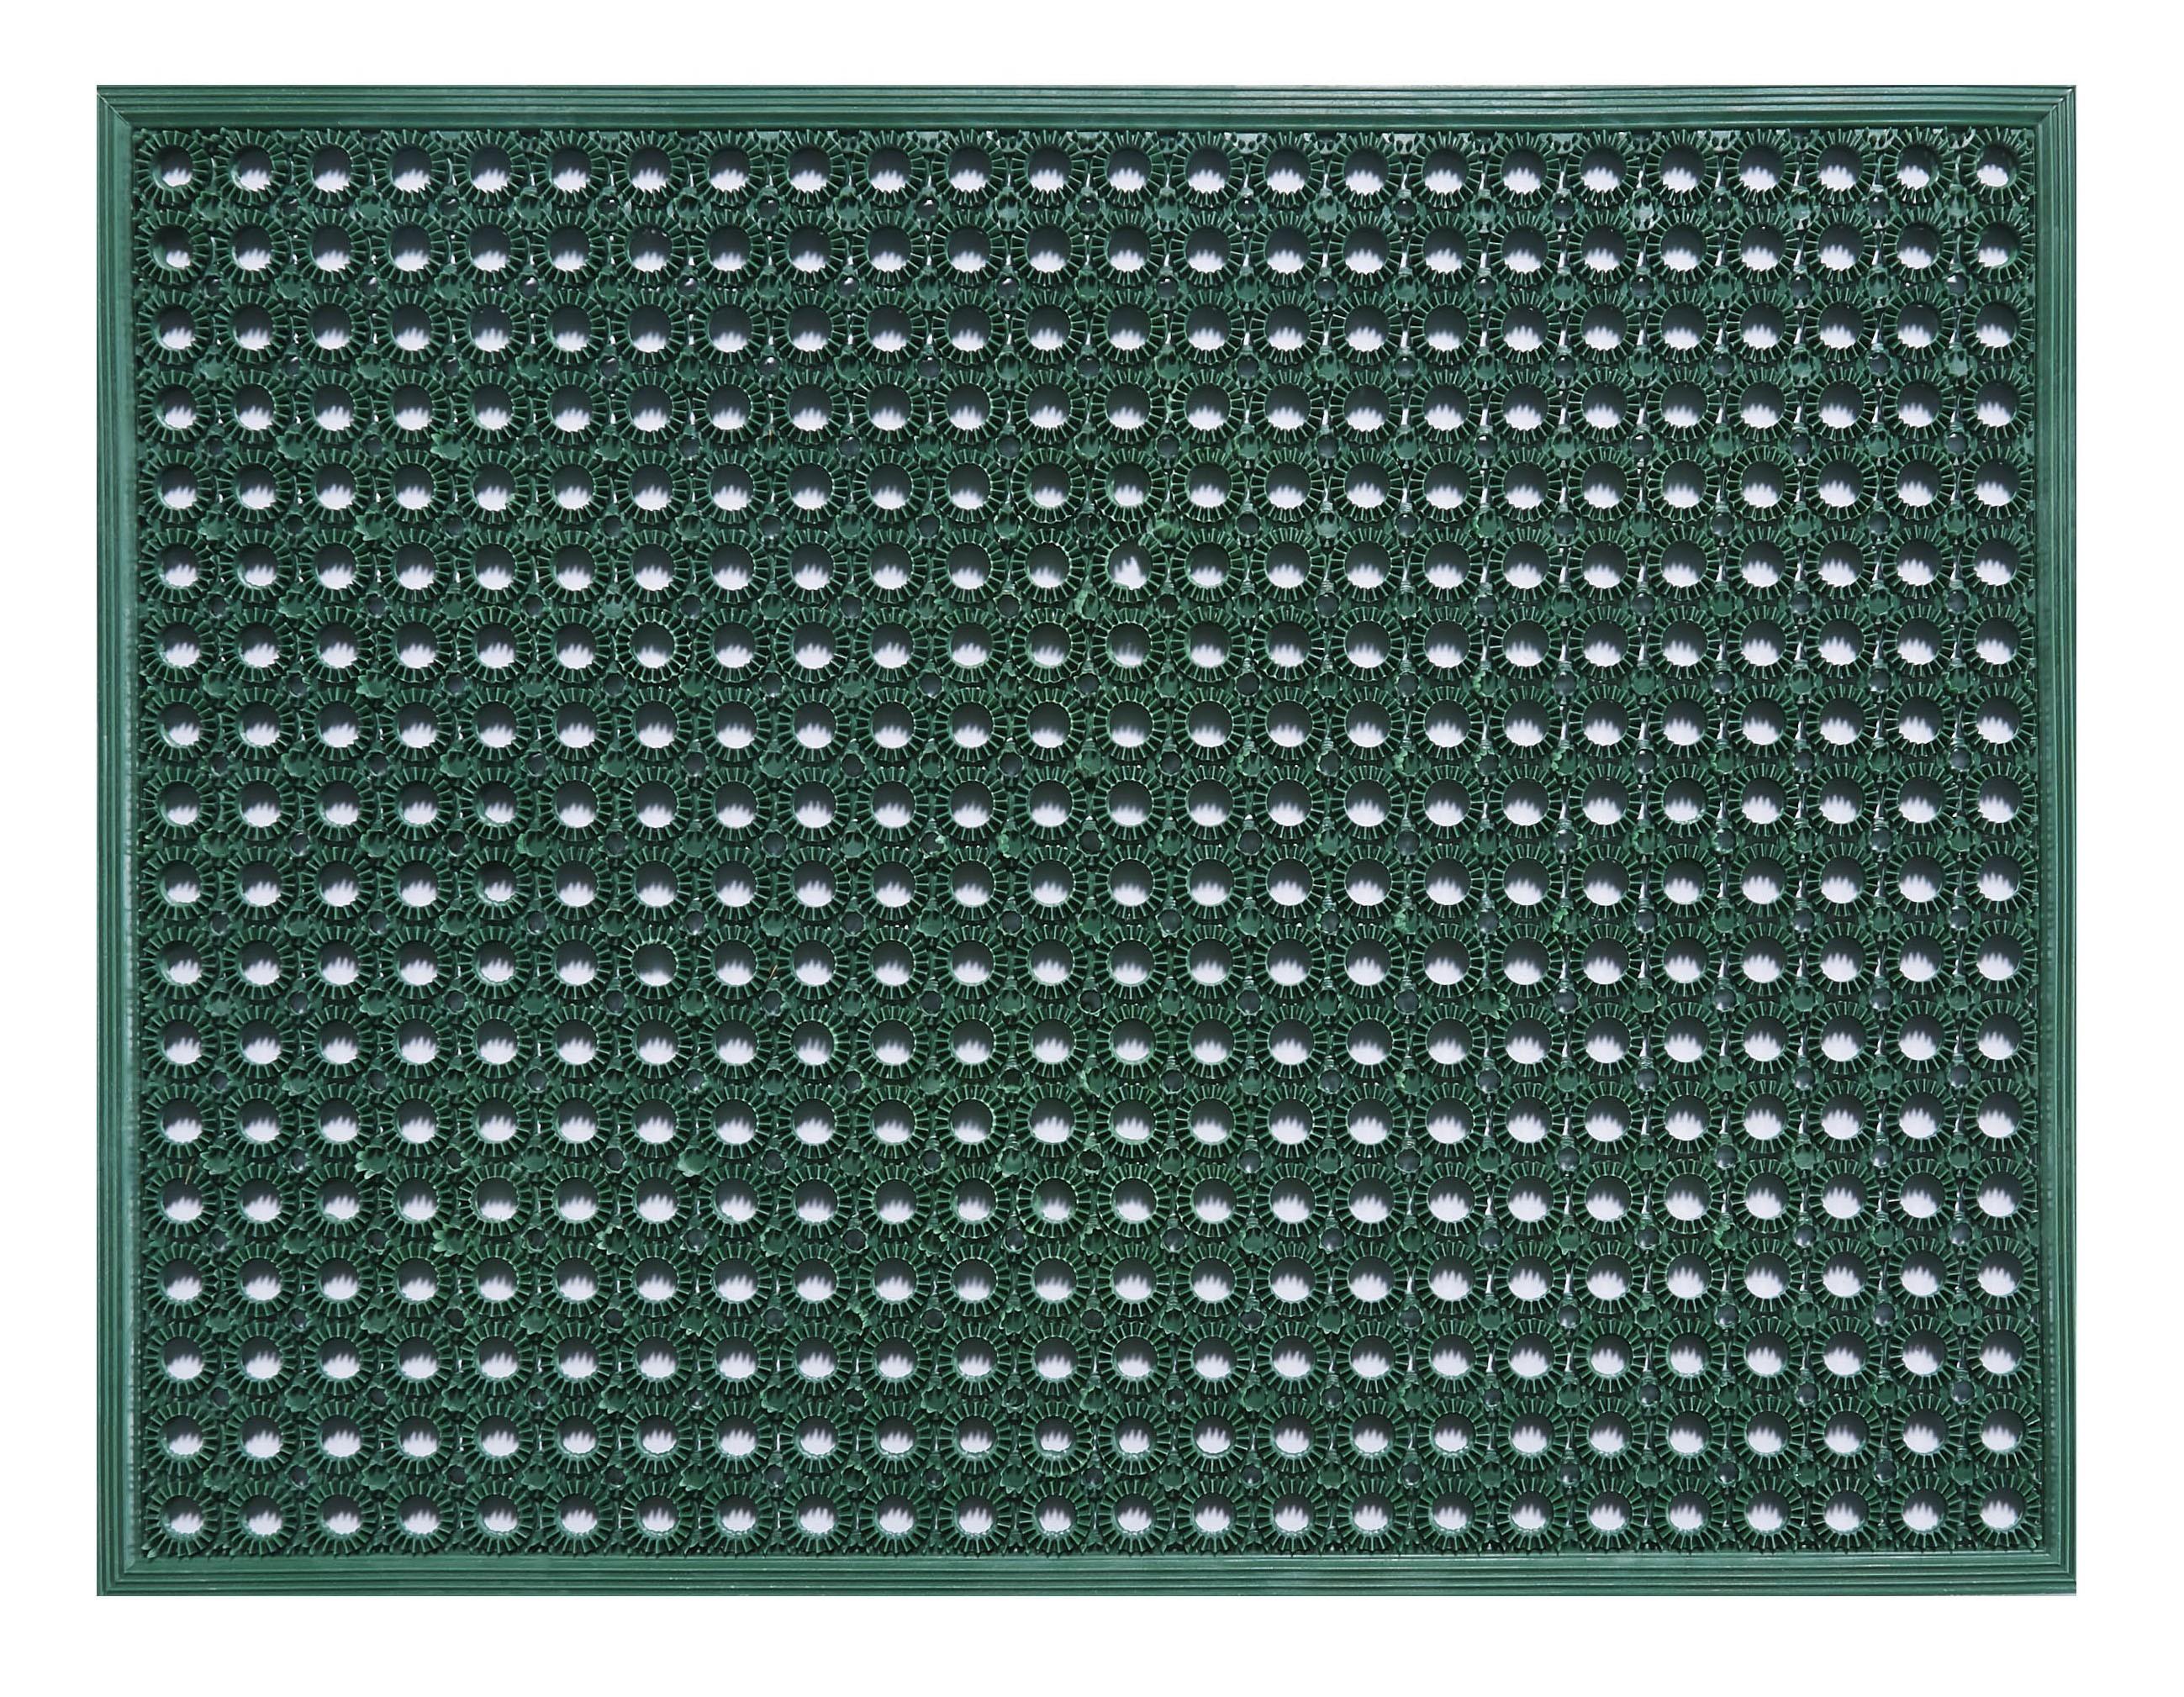 MD-Entree deurmatten Deurmat Lizzy, afm. 48 x 62 cm, groen